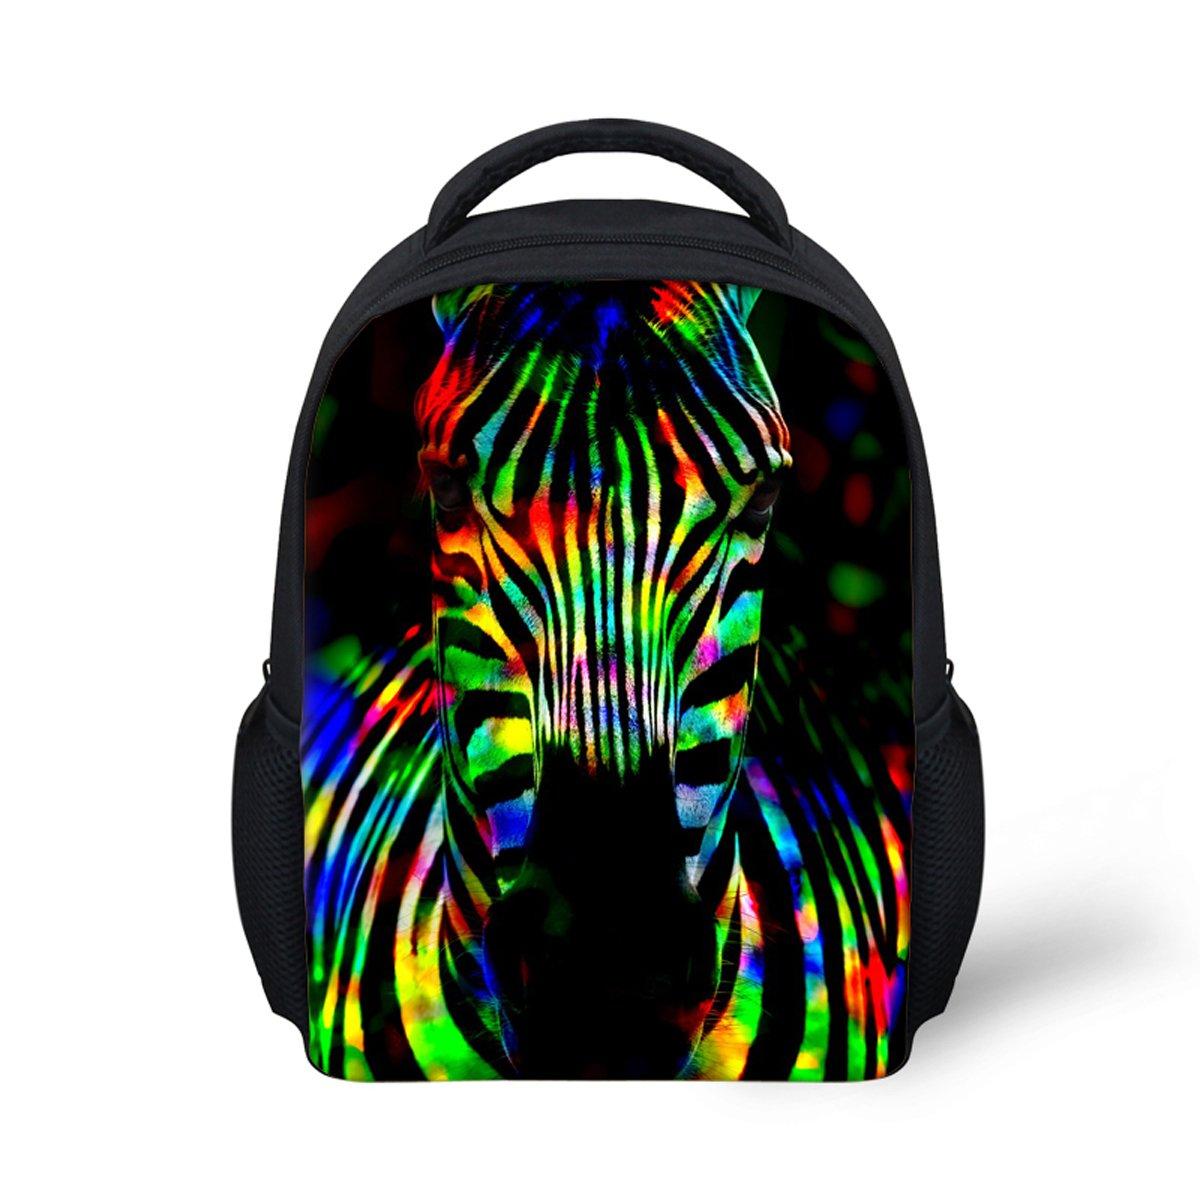 Dellukee 幼児用 ミニバックパック 旅行 通学用バッグ ゼブラプリント   B07DLBDWDT